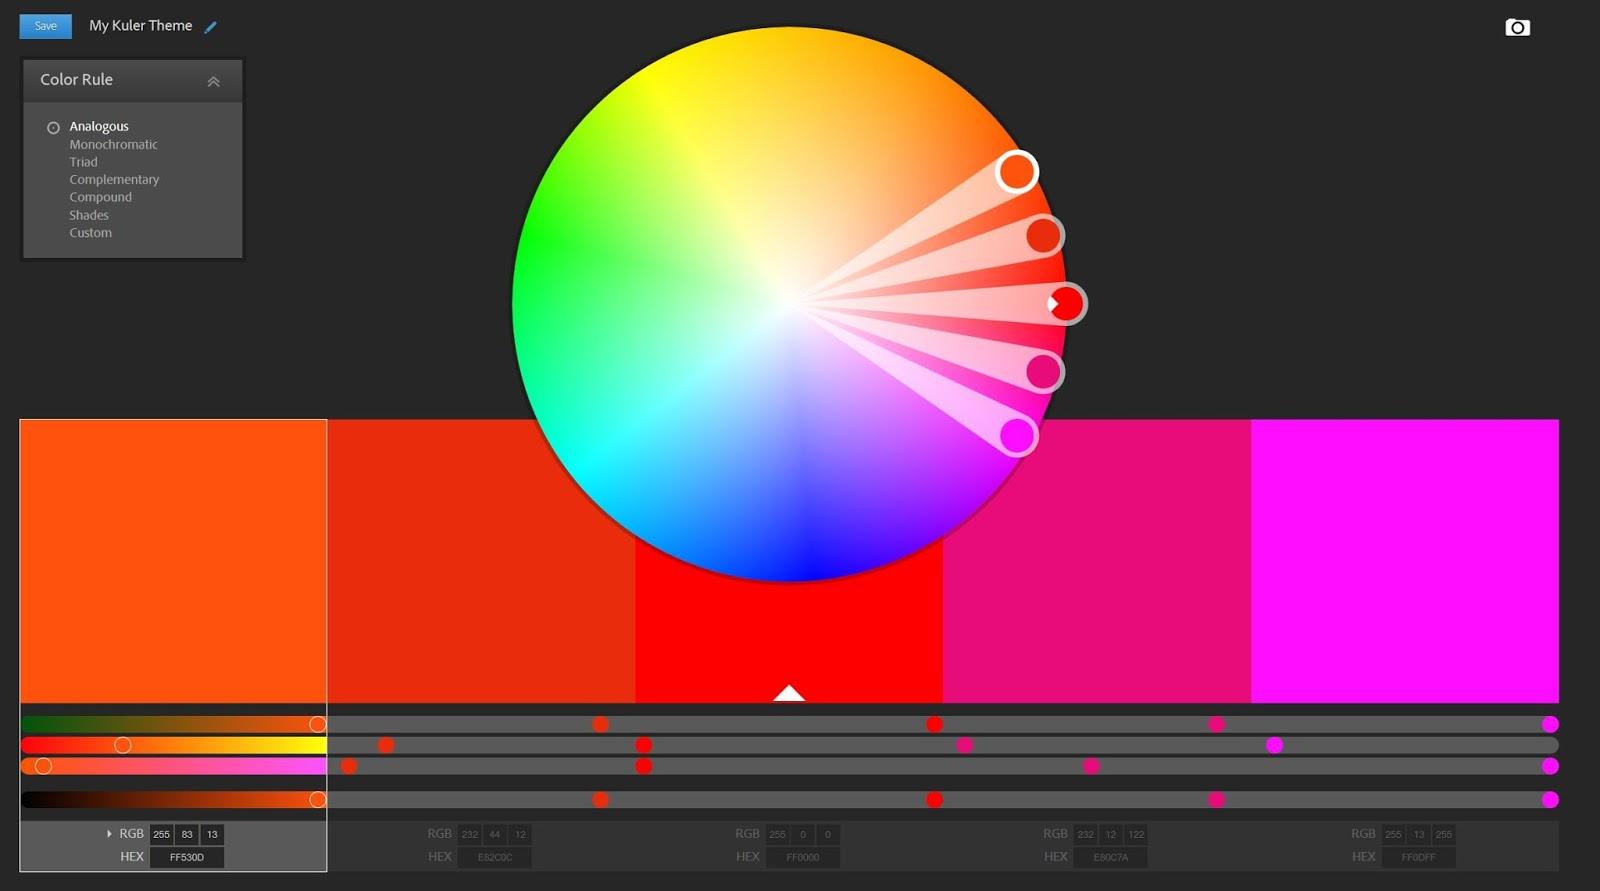 Interface de Adobe Kuler